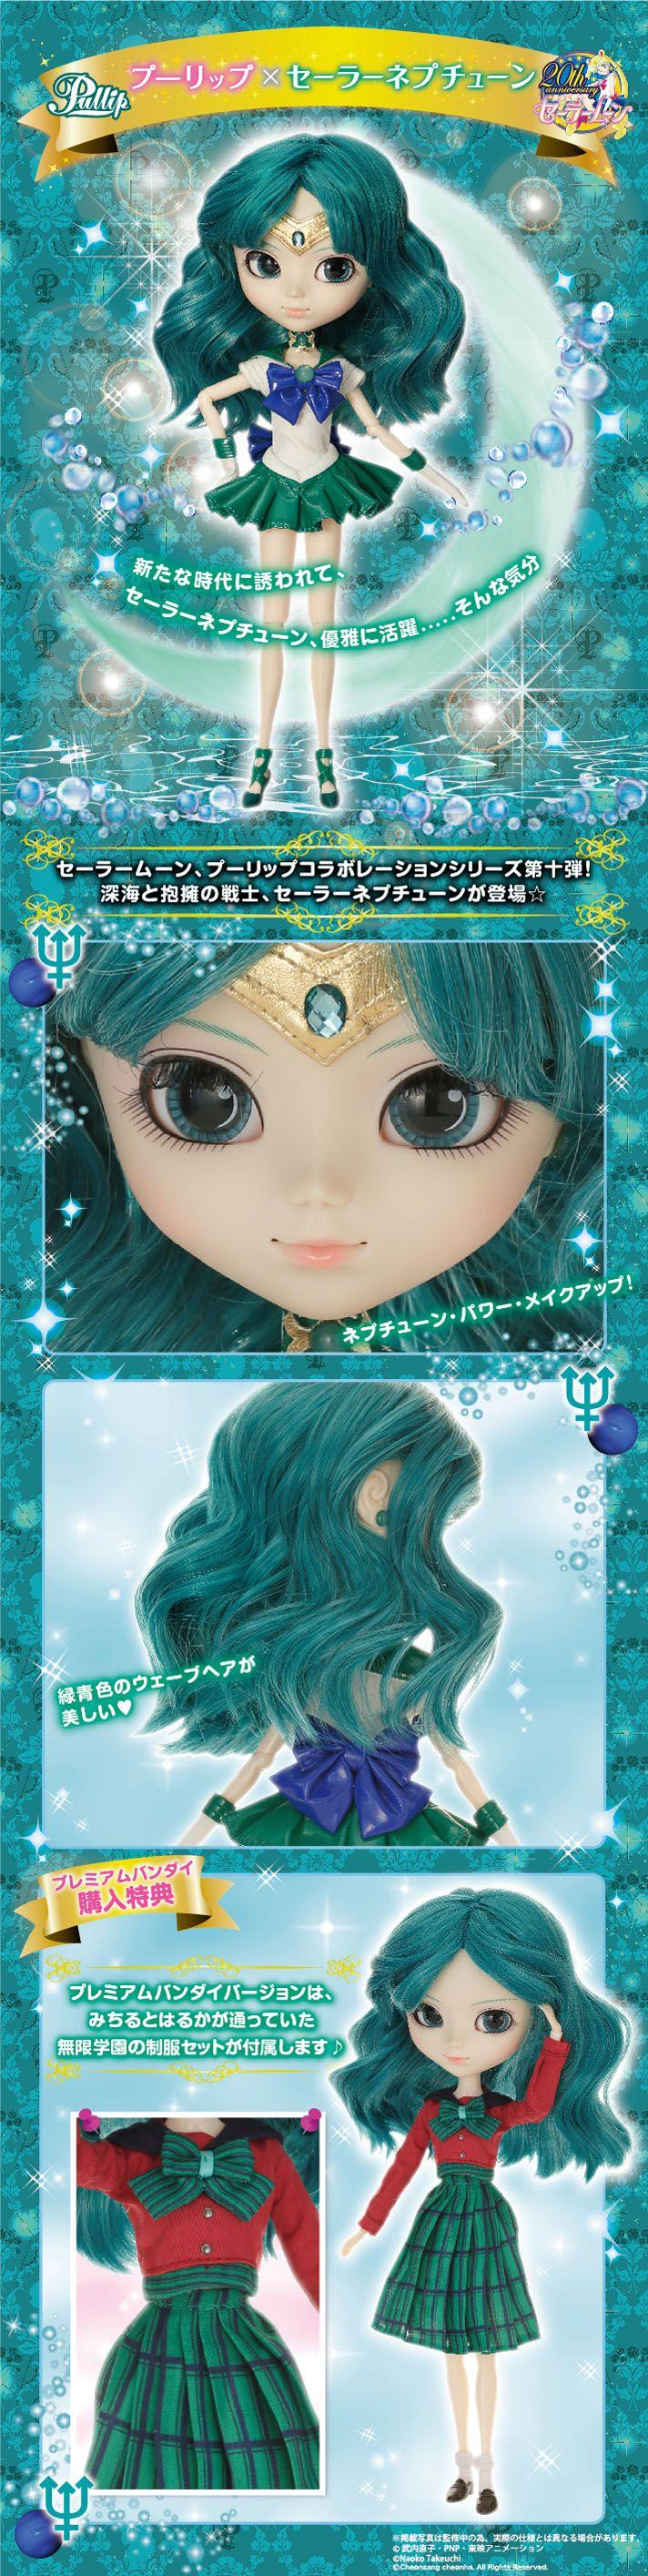 Pullip Sailor Neptune Premium Bandai Limited Ver. is Here! - A Rinkya Blog